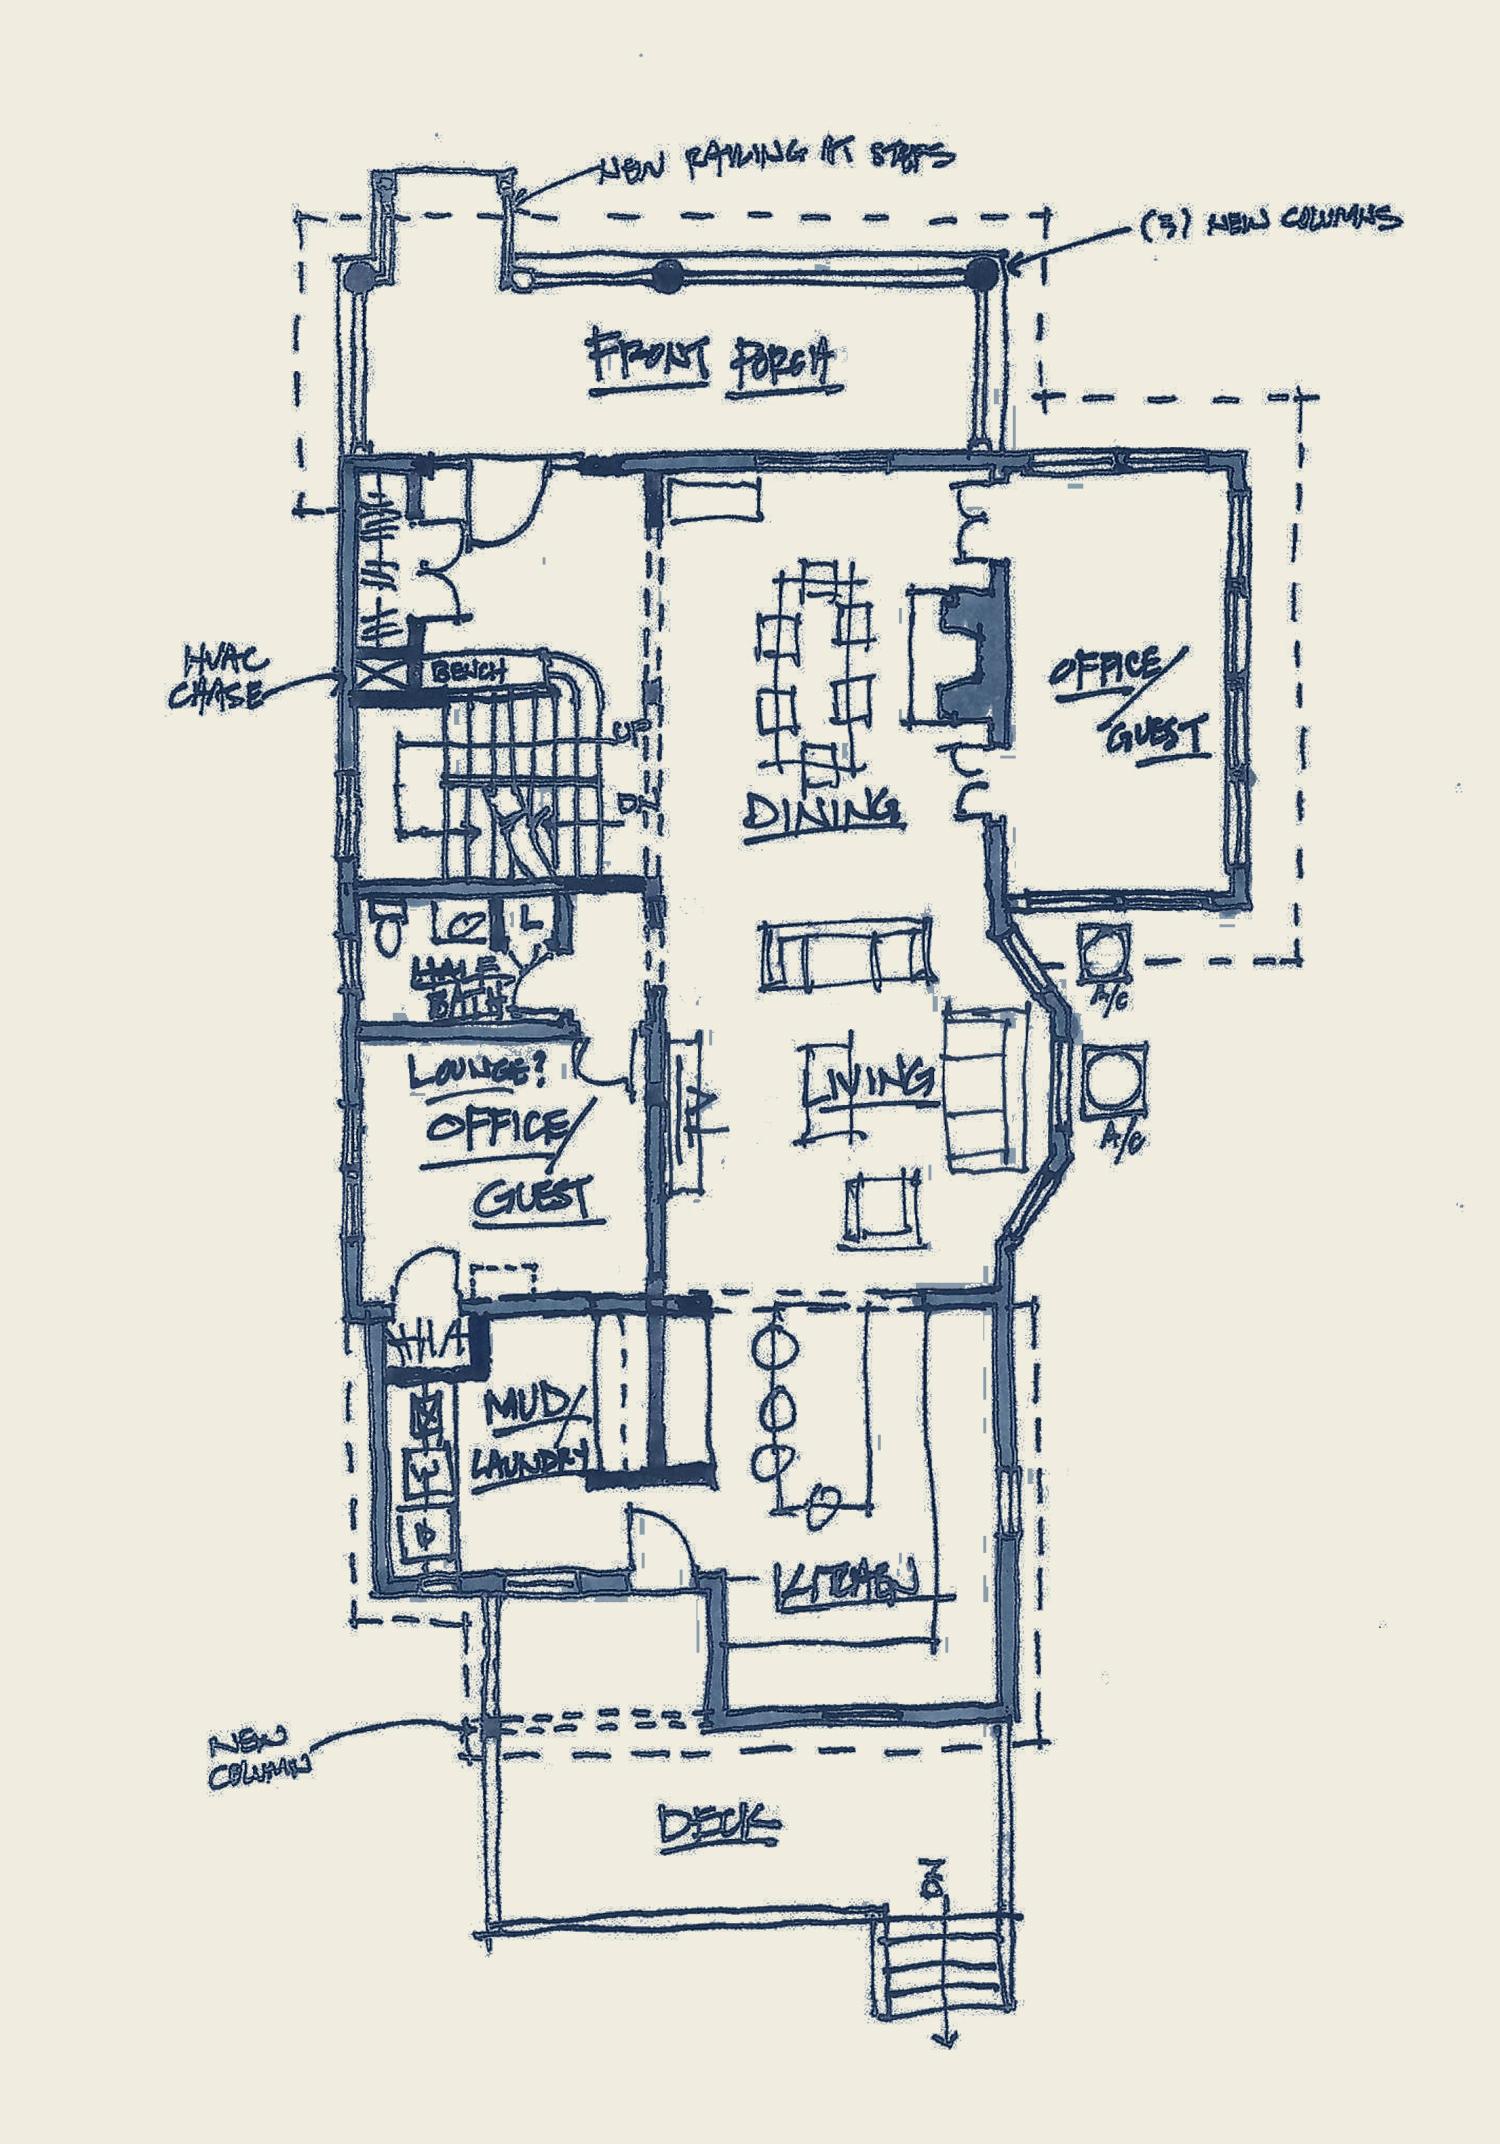 hand drawn floor plan design sketch